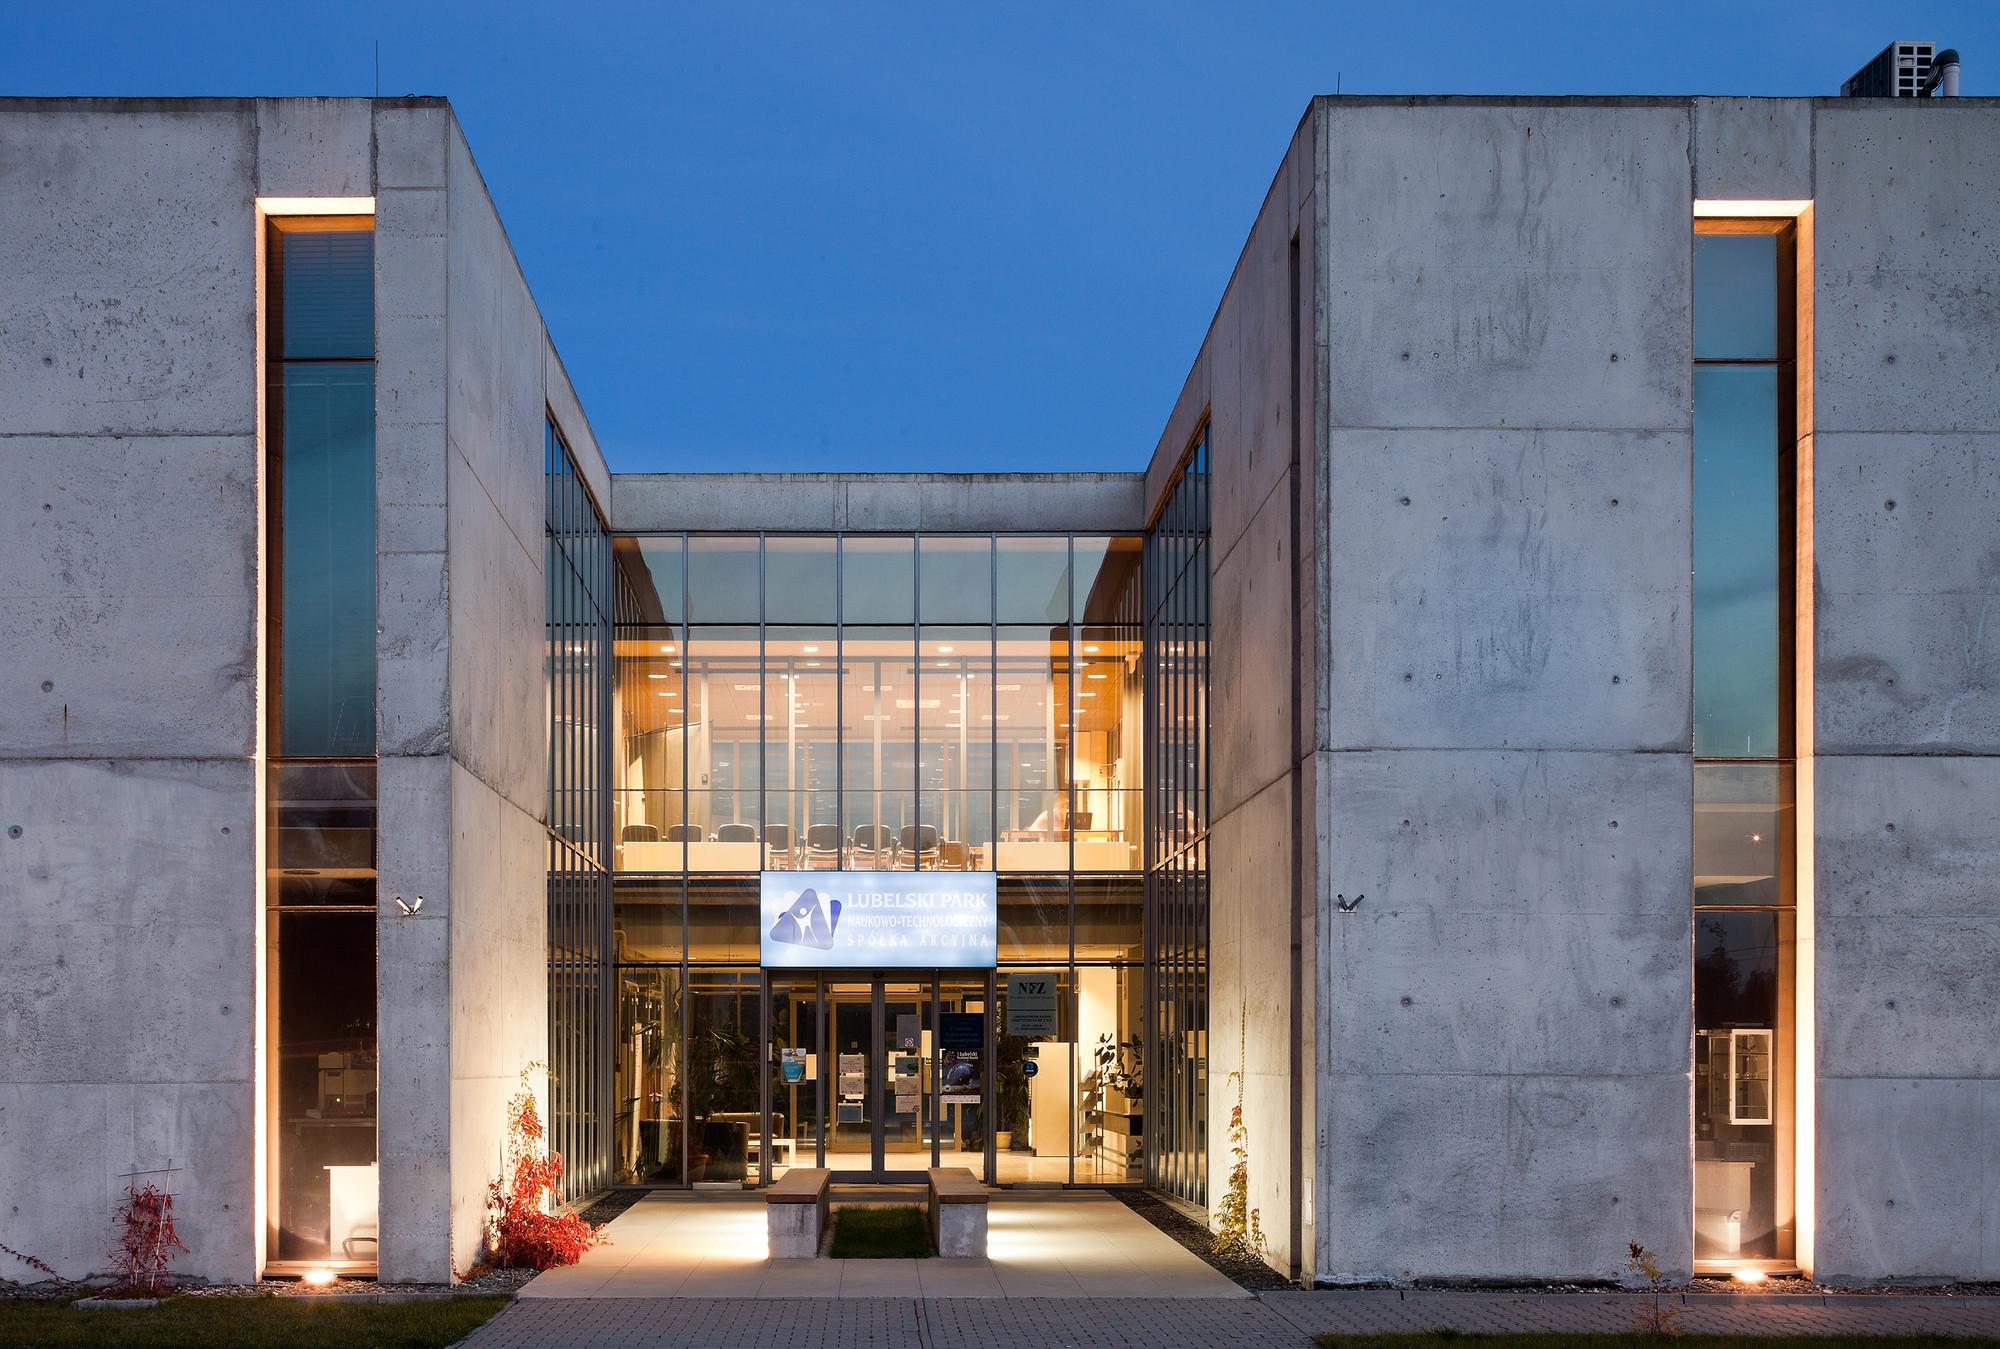 Gallery of Lublin Science And Technology Park / Stelmach I Partnerzy Biuro Architektoniczne - 5